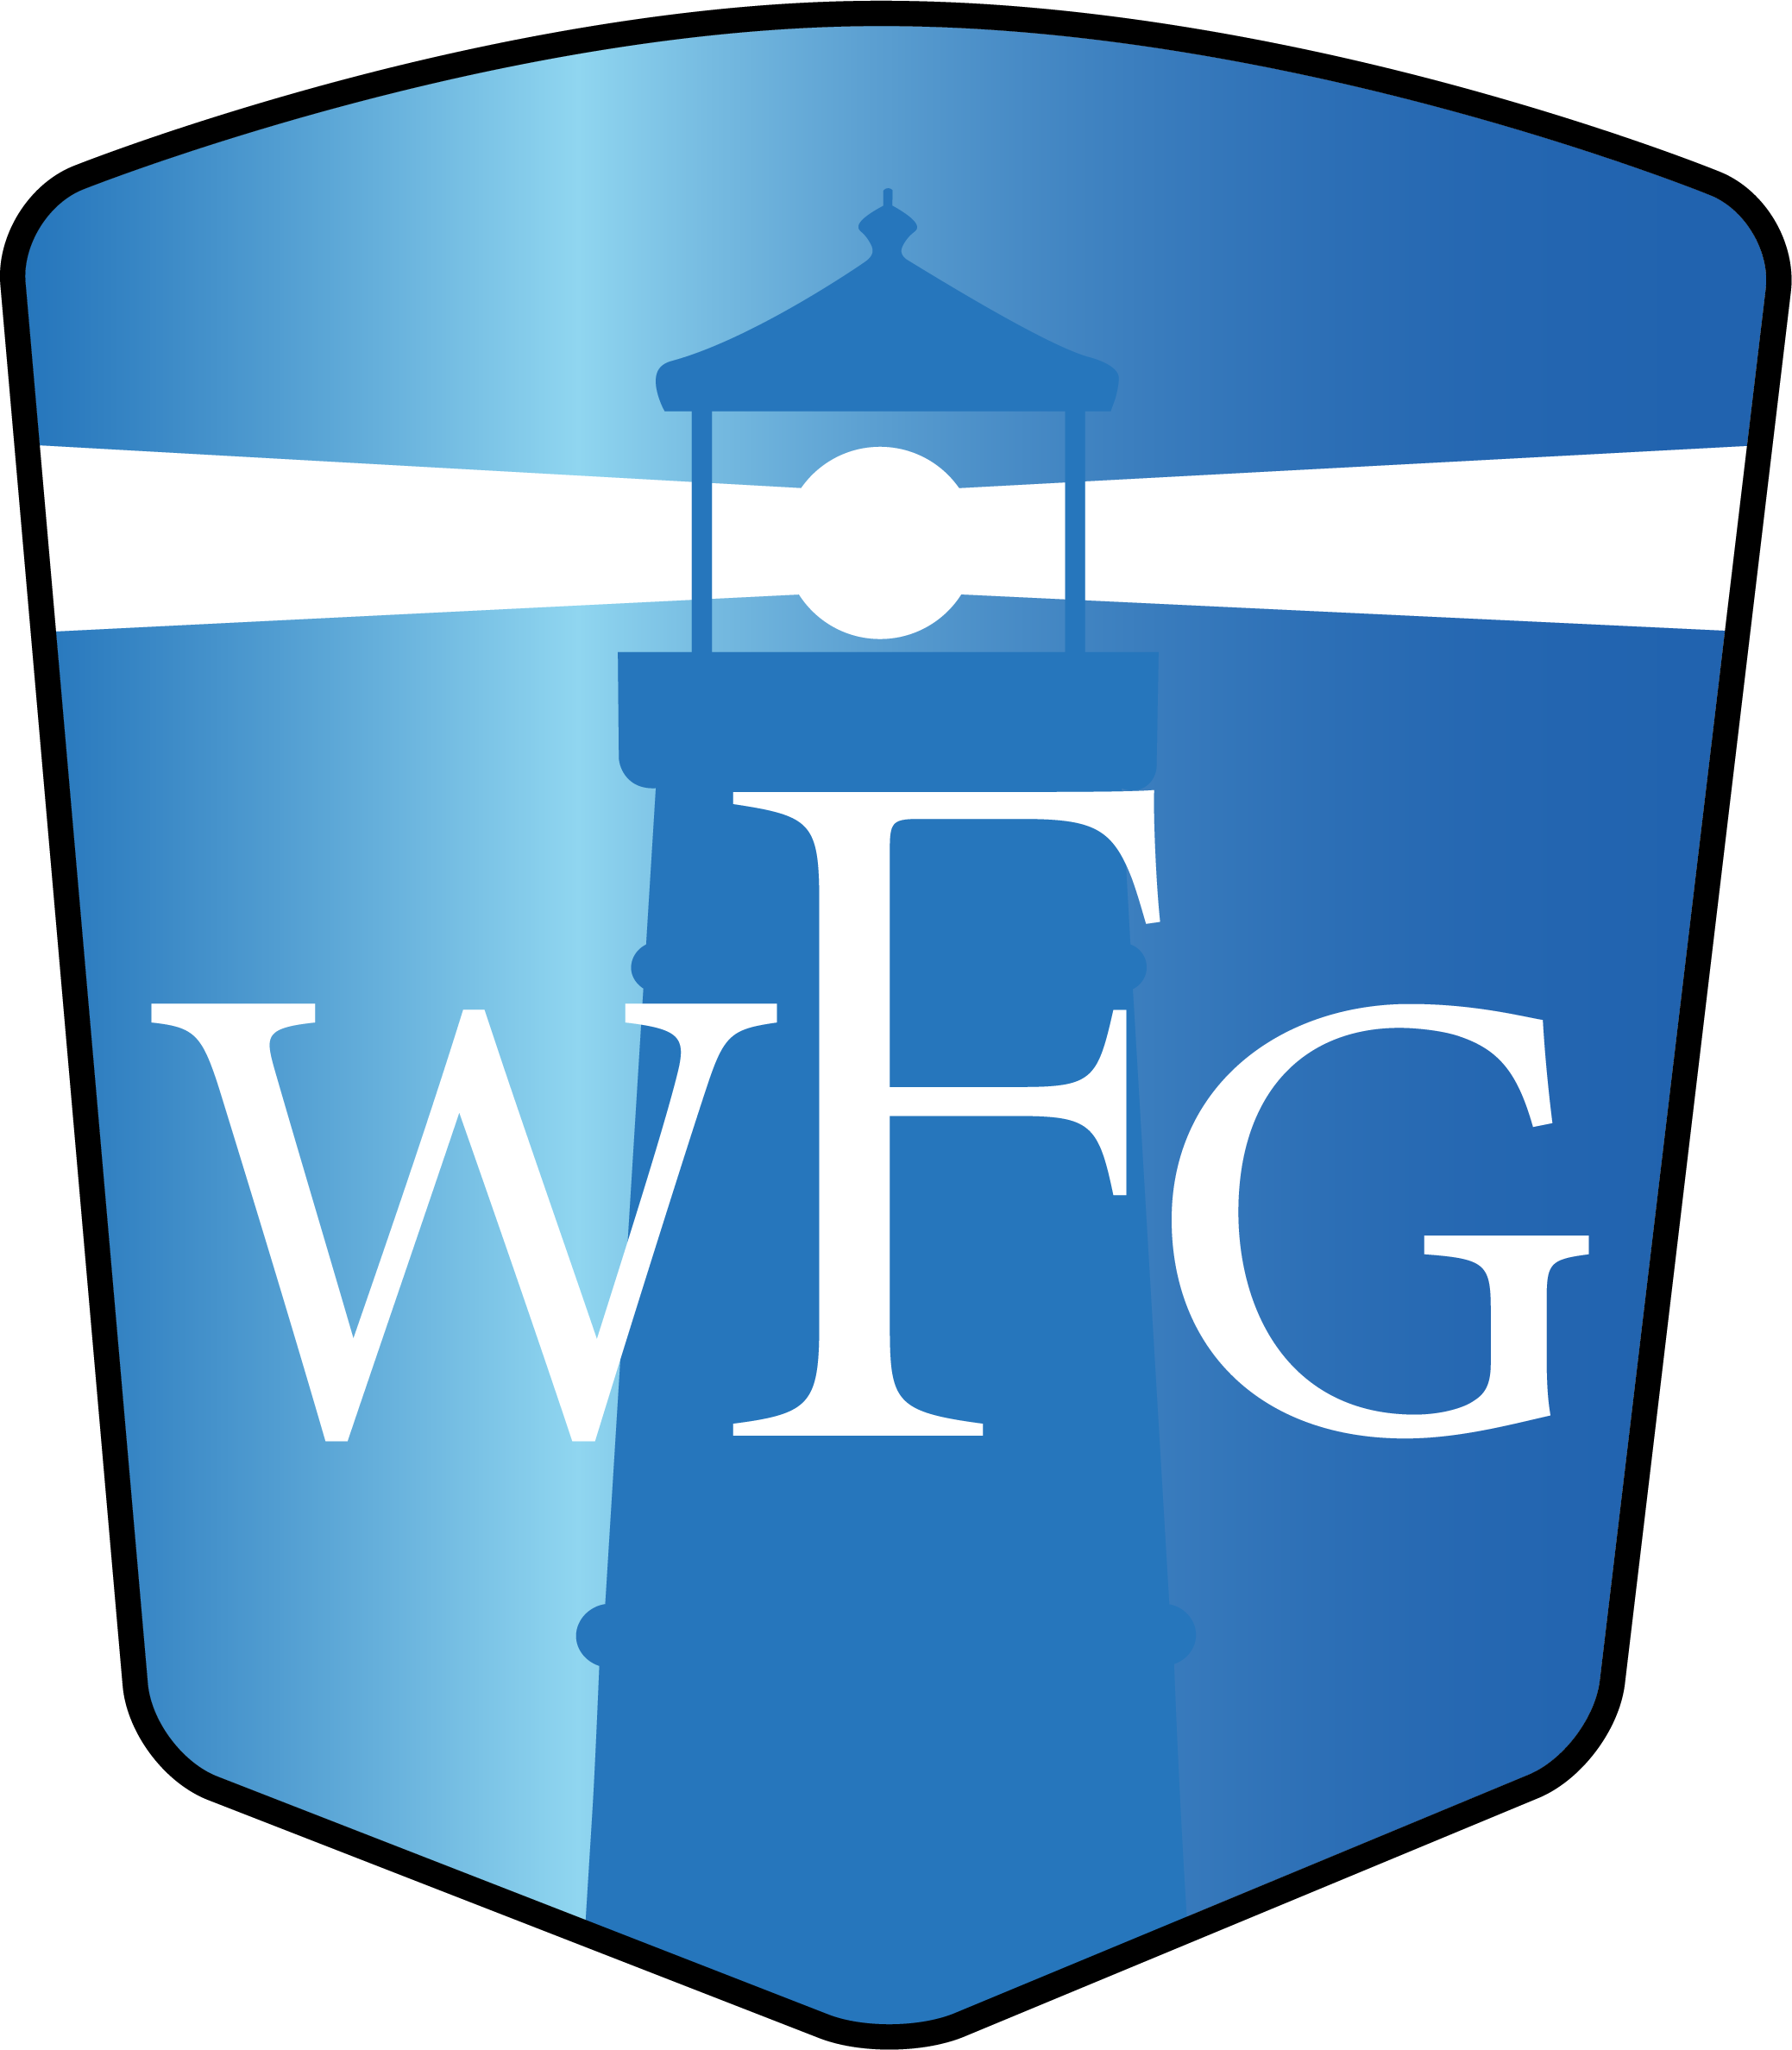 Wilson Financial Group